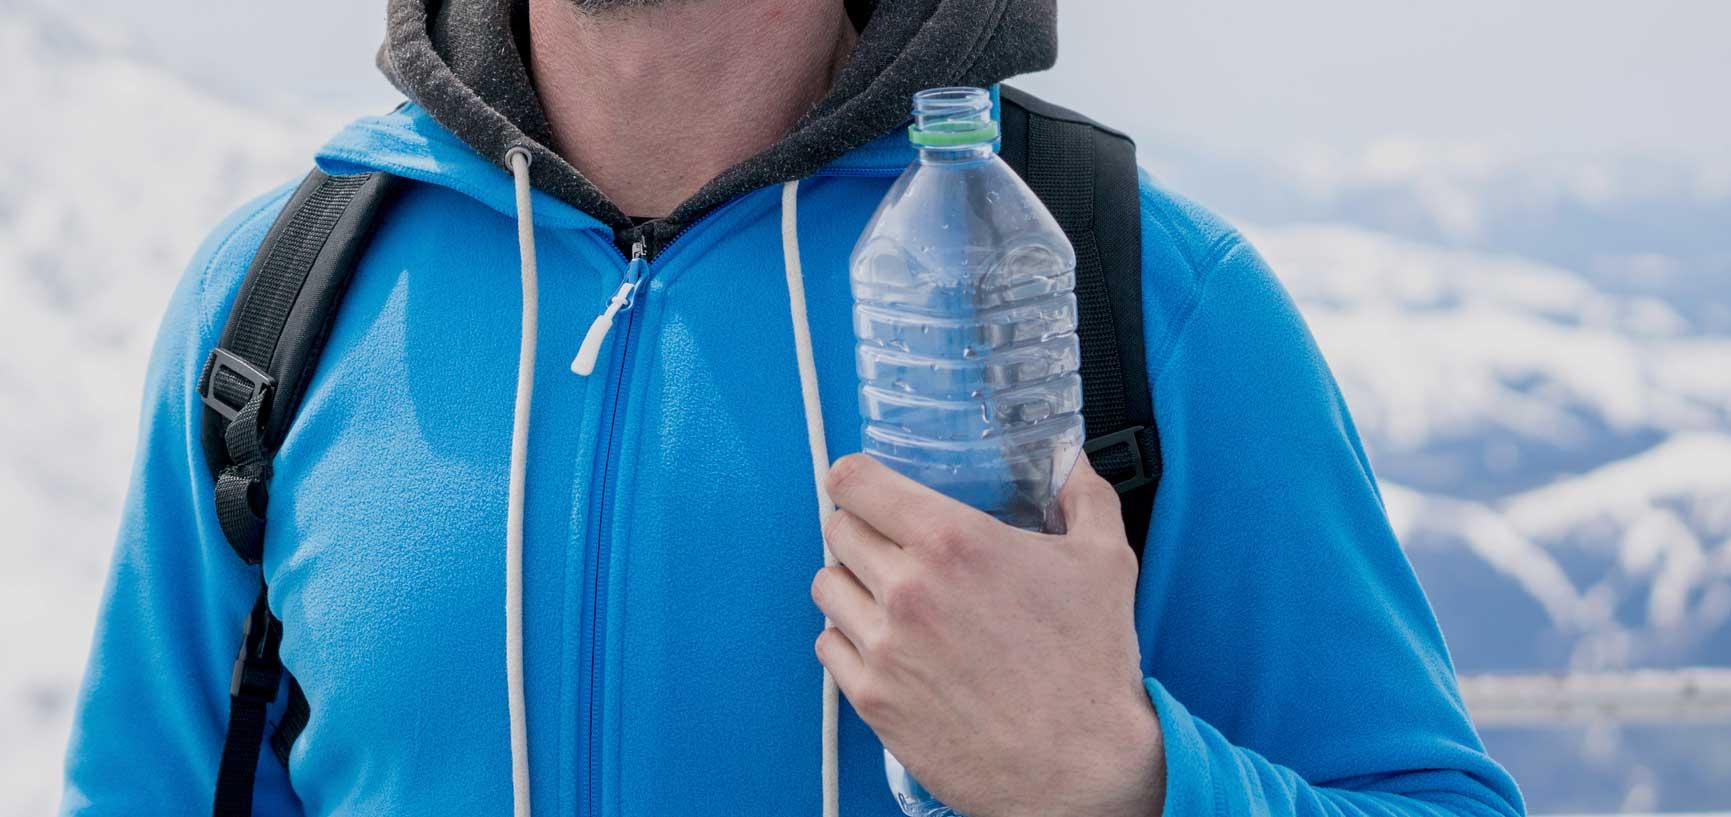 Plastic Bottle 16 Hacks for Survival